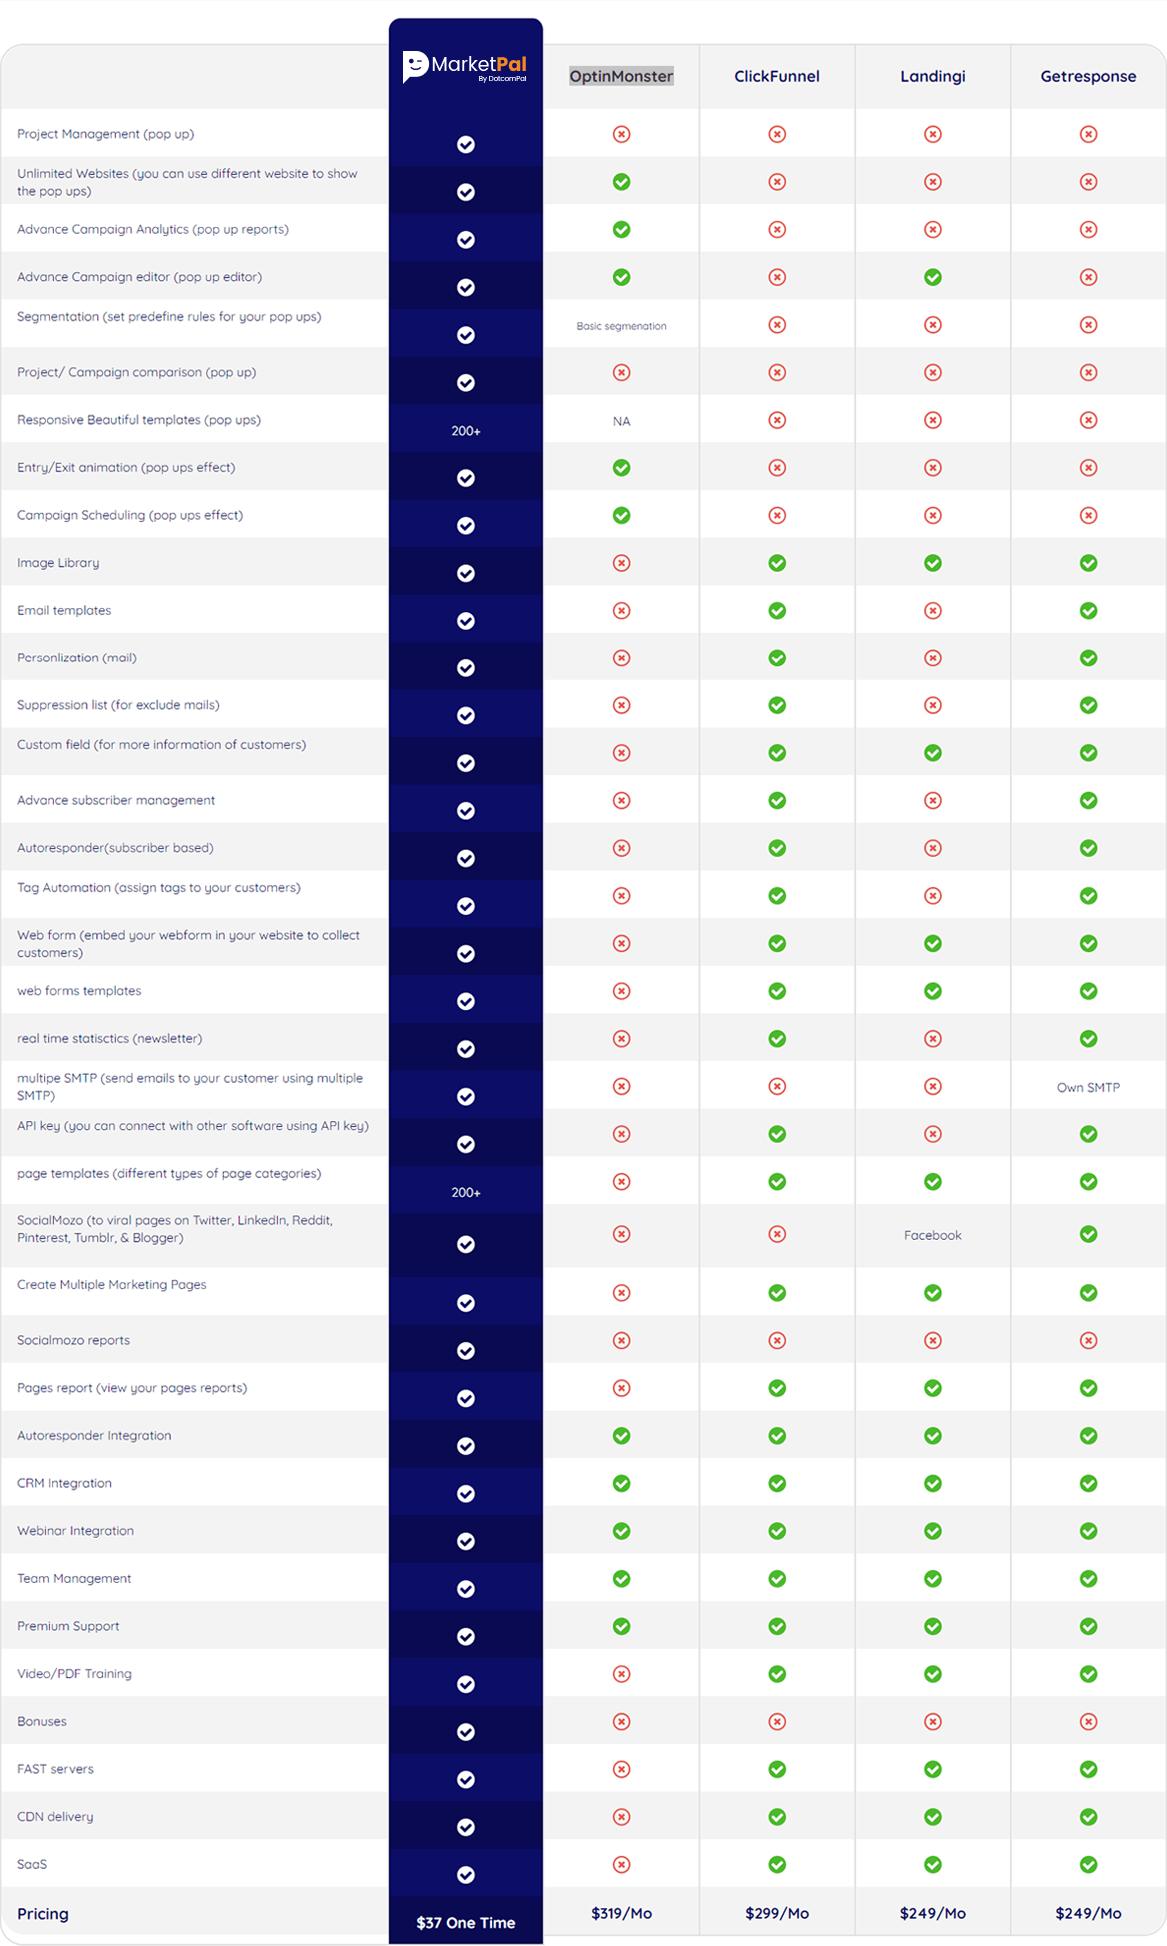 MarketPal-comparison